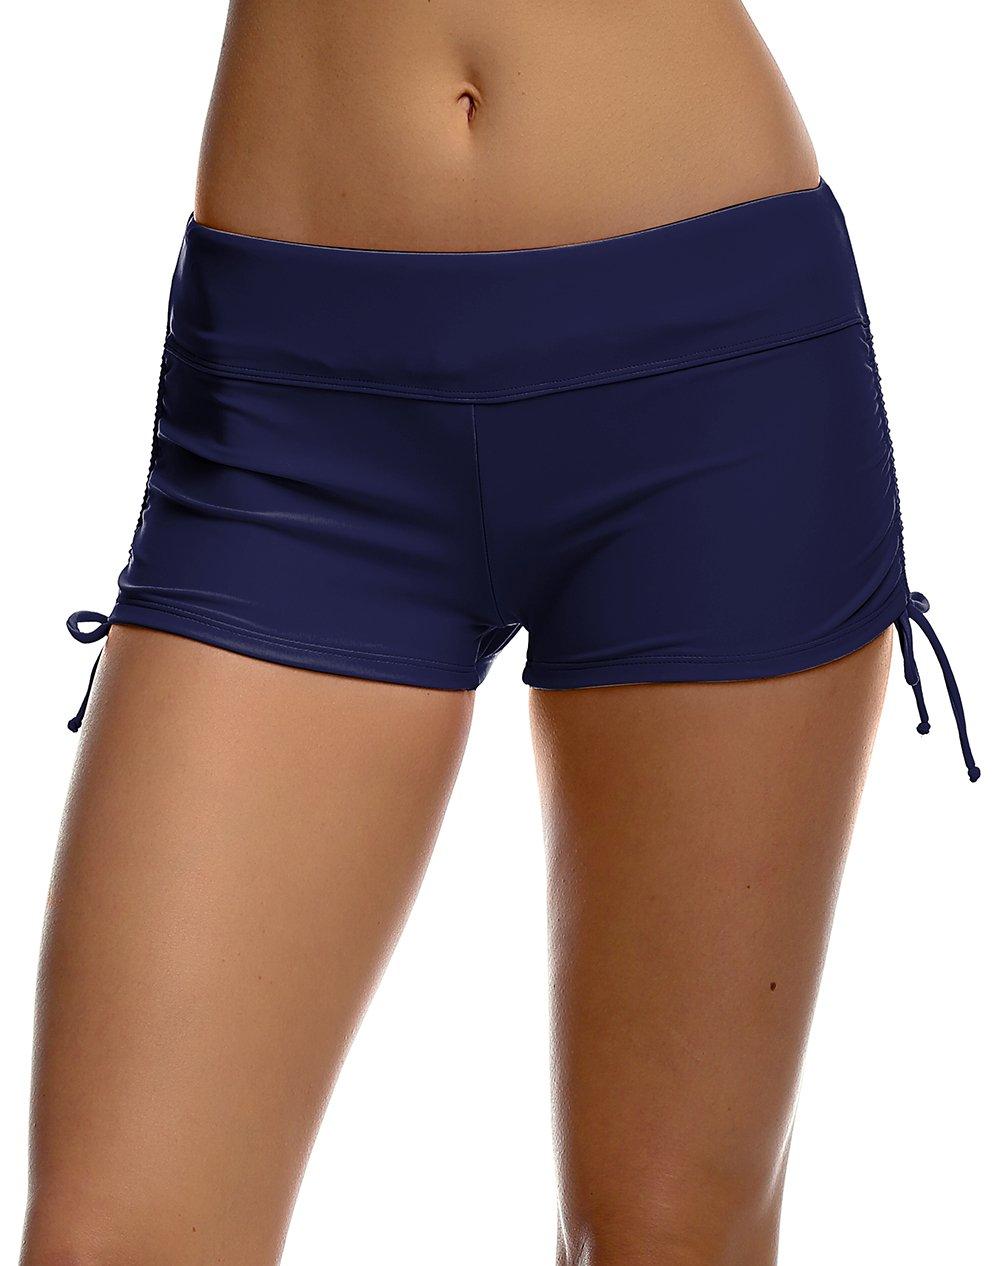 Women's Solid Black Beach Pant Bikini Bottom Adjustable Tie Boy Short Navy M